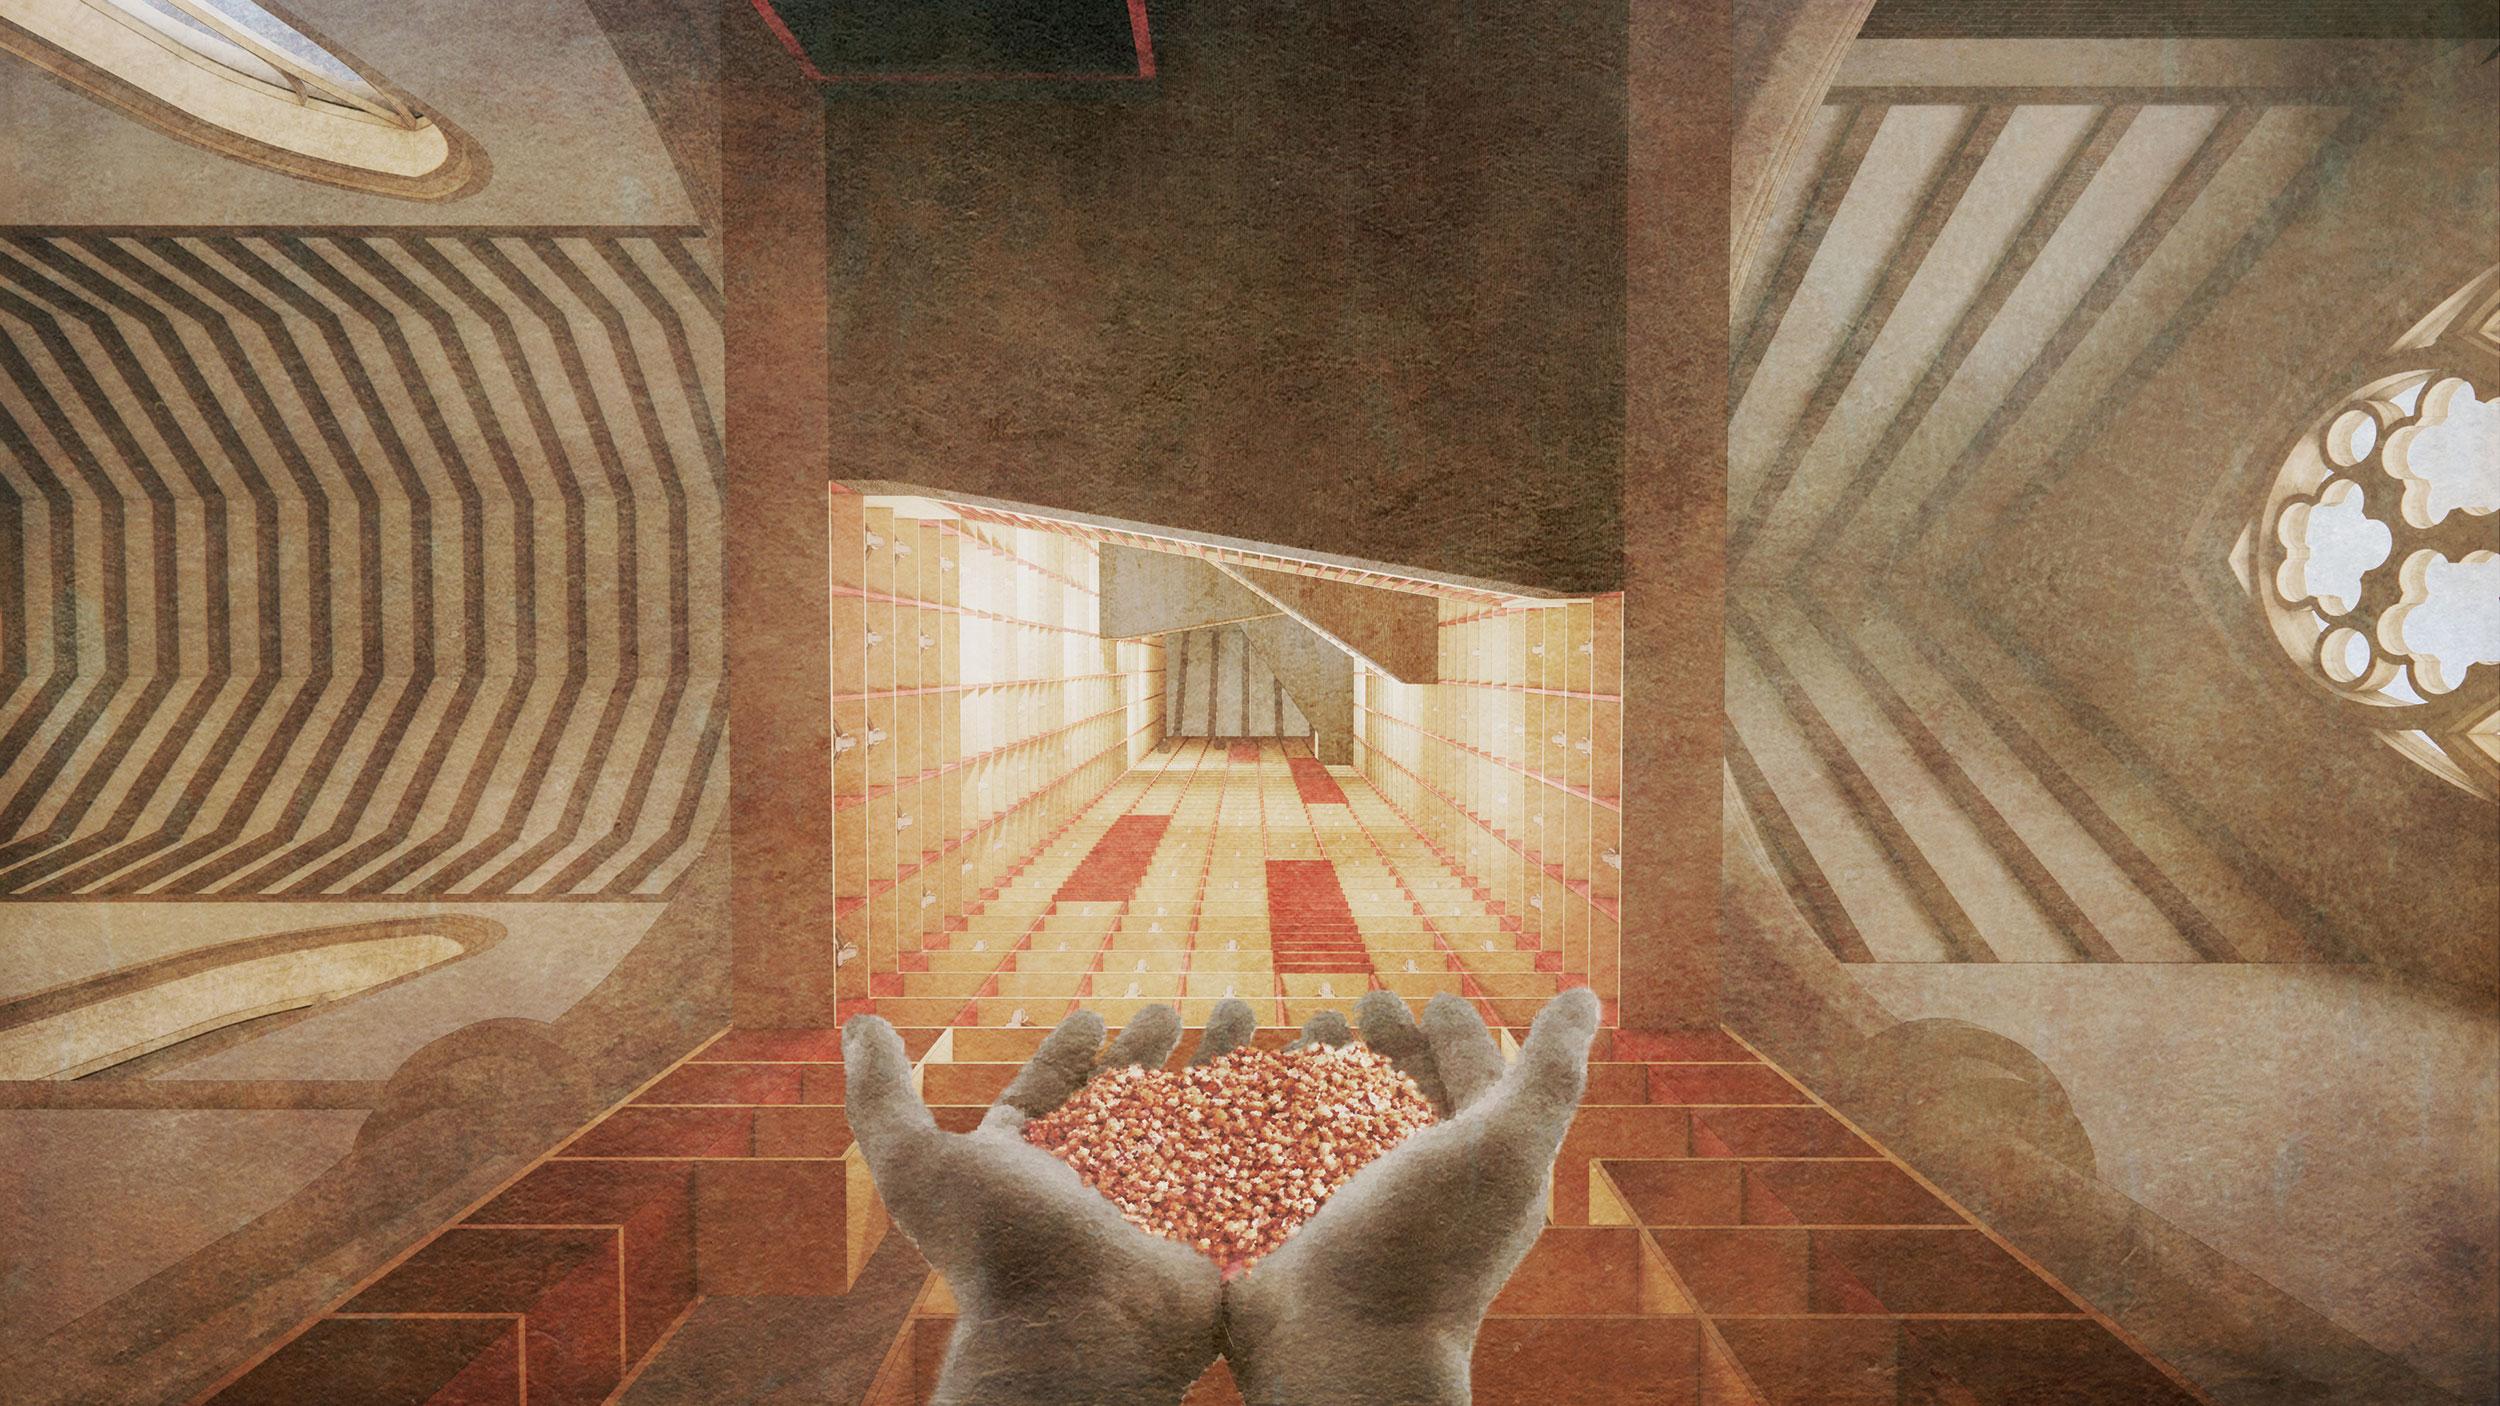 A spiritual moment / seed altar